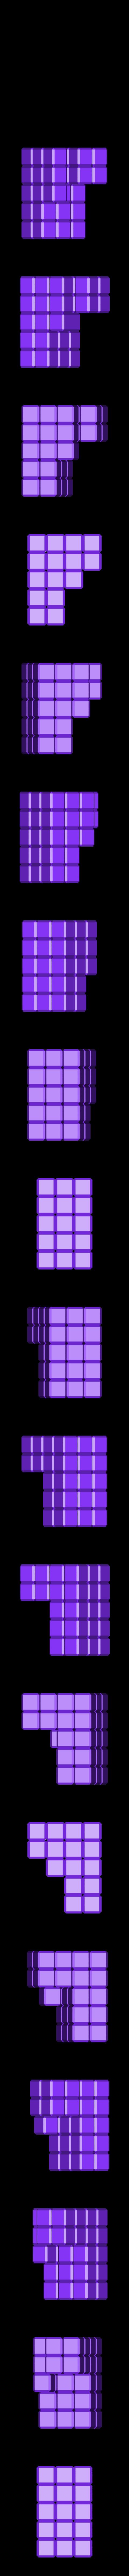 41_units.stl Download free STL file Cube Puzzle: 5 x 5 x 5, Five-Piece Dissection • 3D print model, LGBU